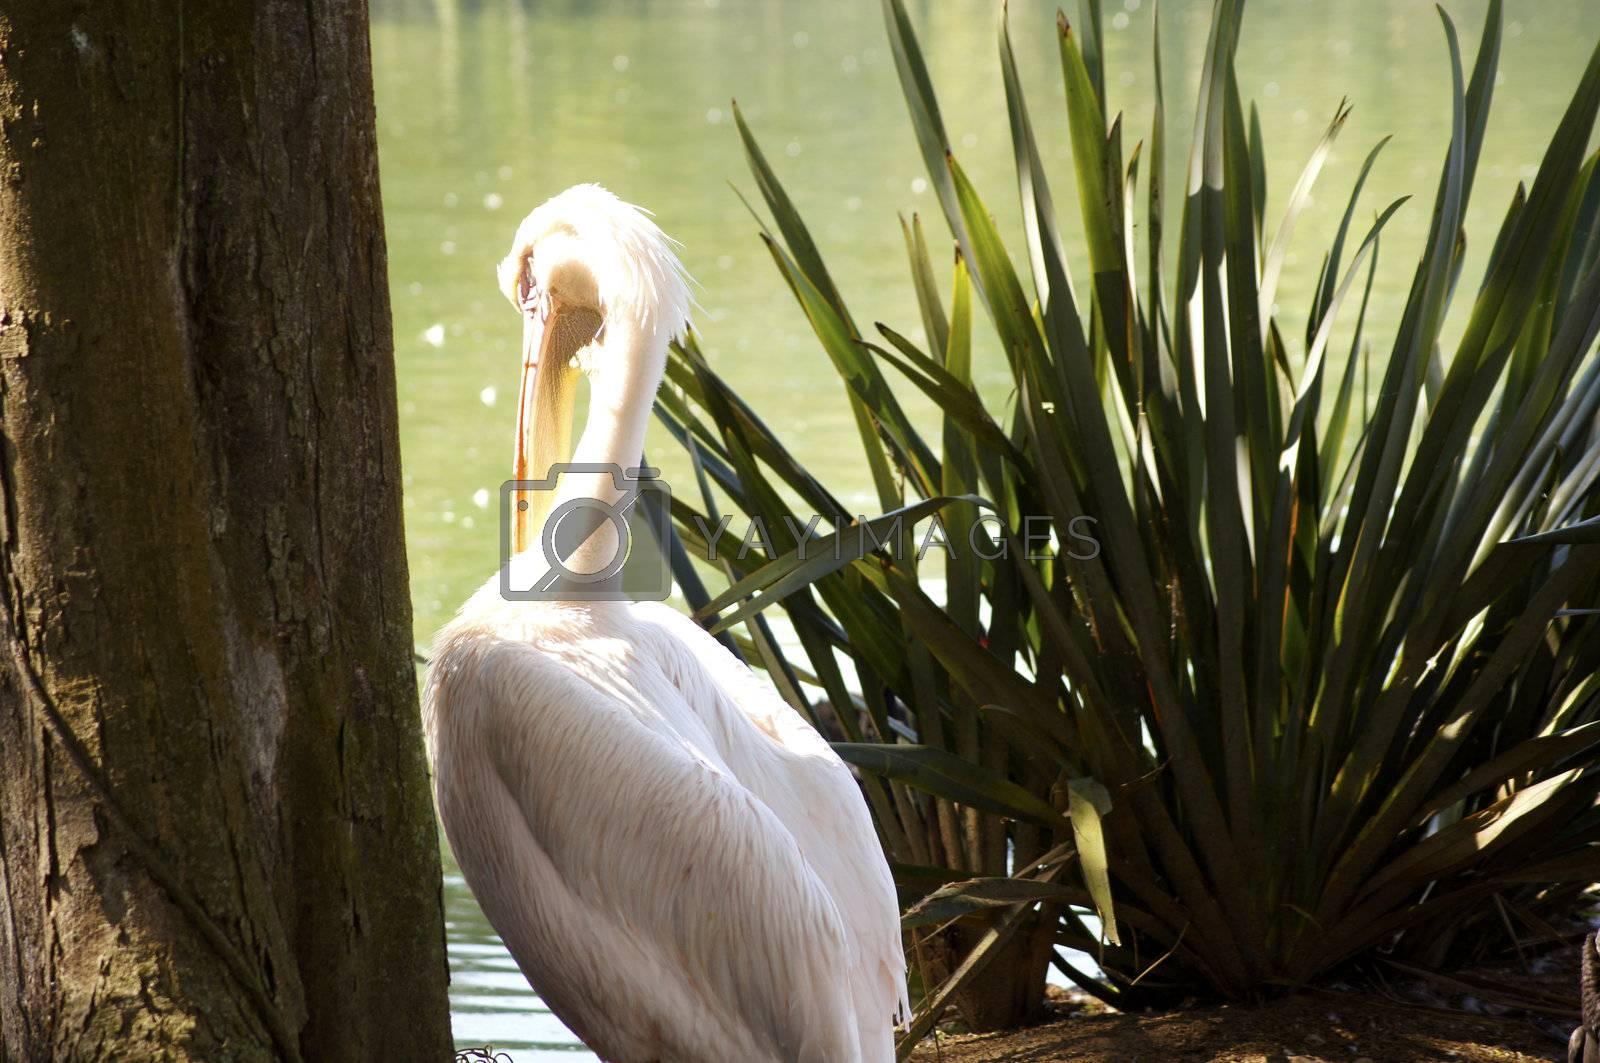 Habitat aquatic environments such as mangroves and muddy beaches, and undertakes seasonal migrations